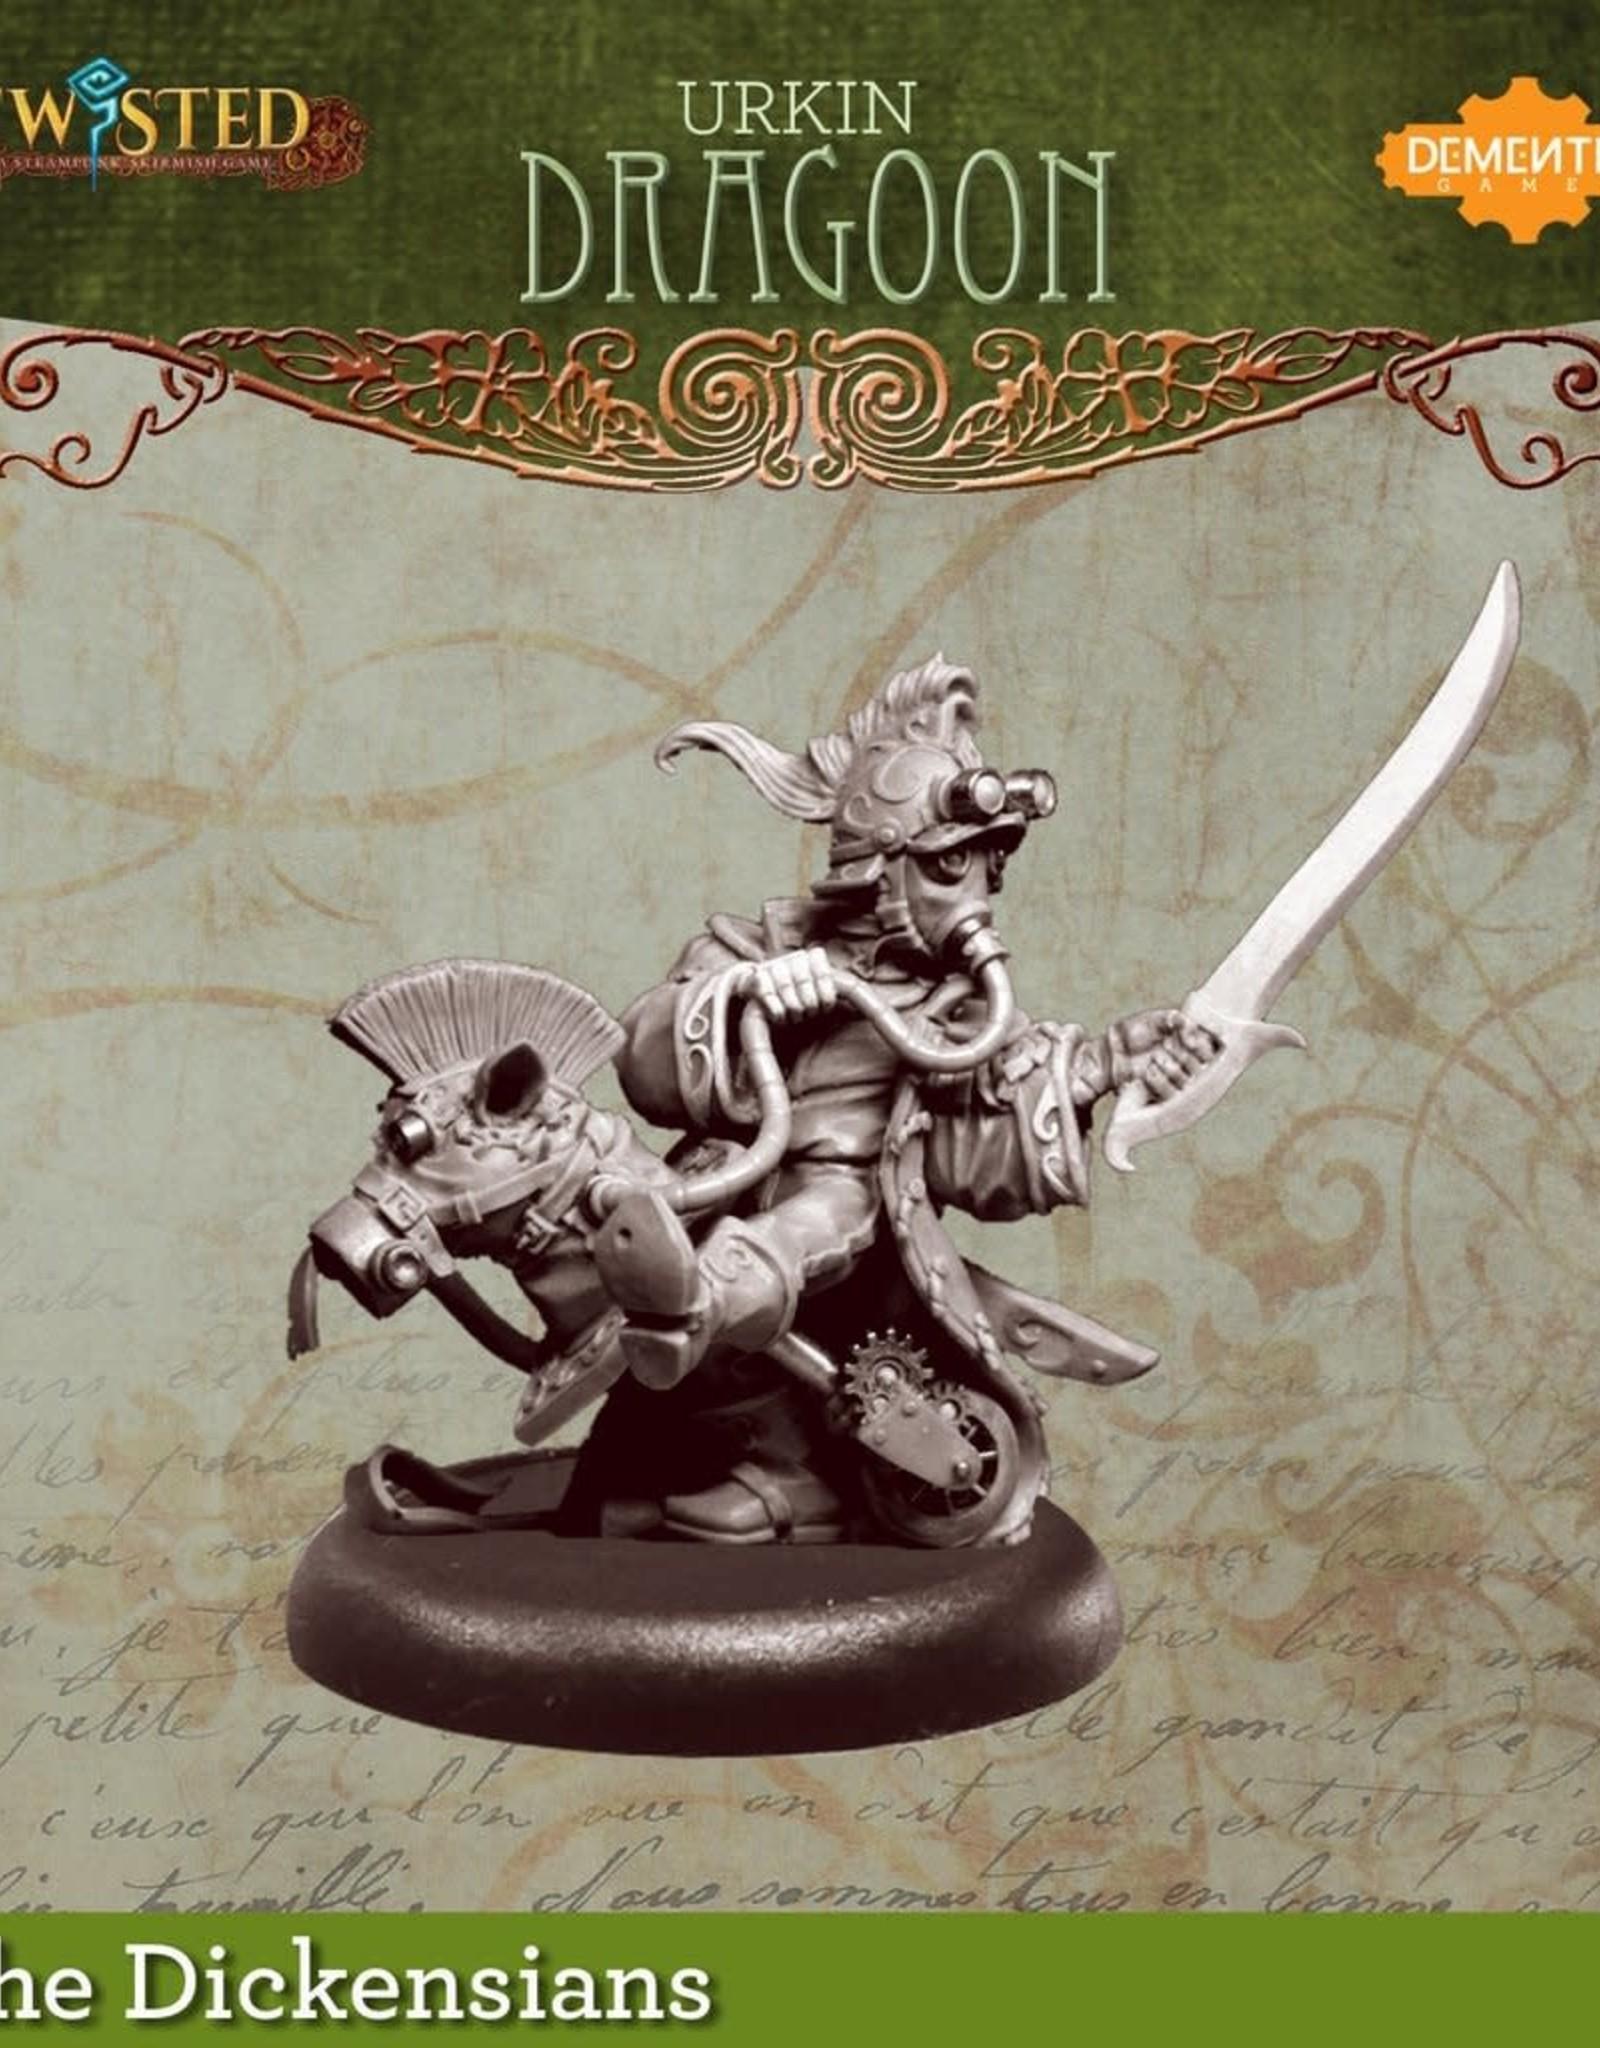 Demented Games Urkin Dragoon - Resin